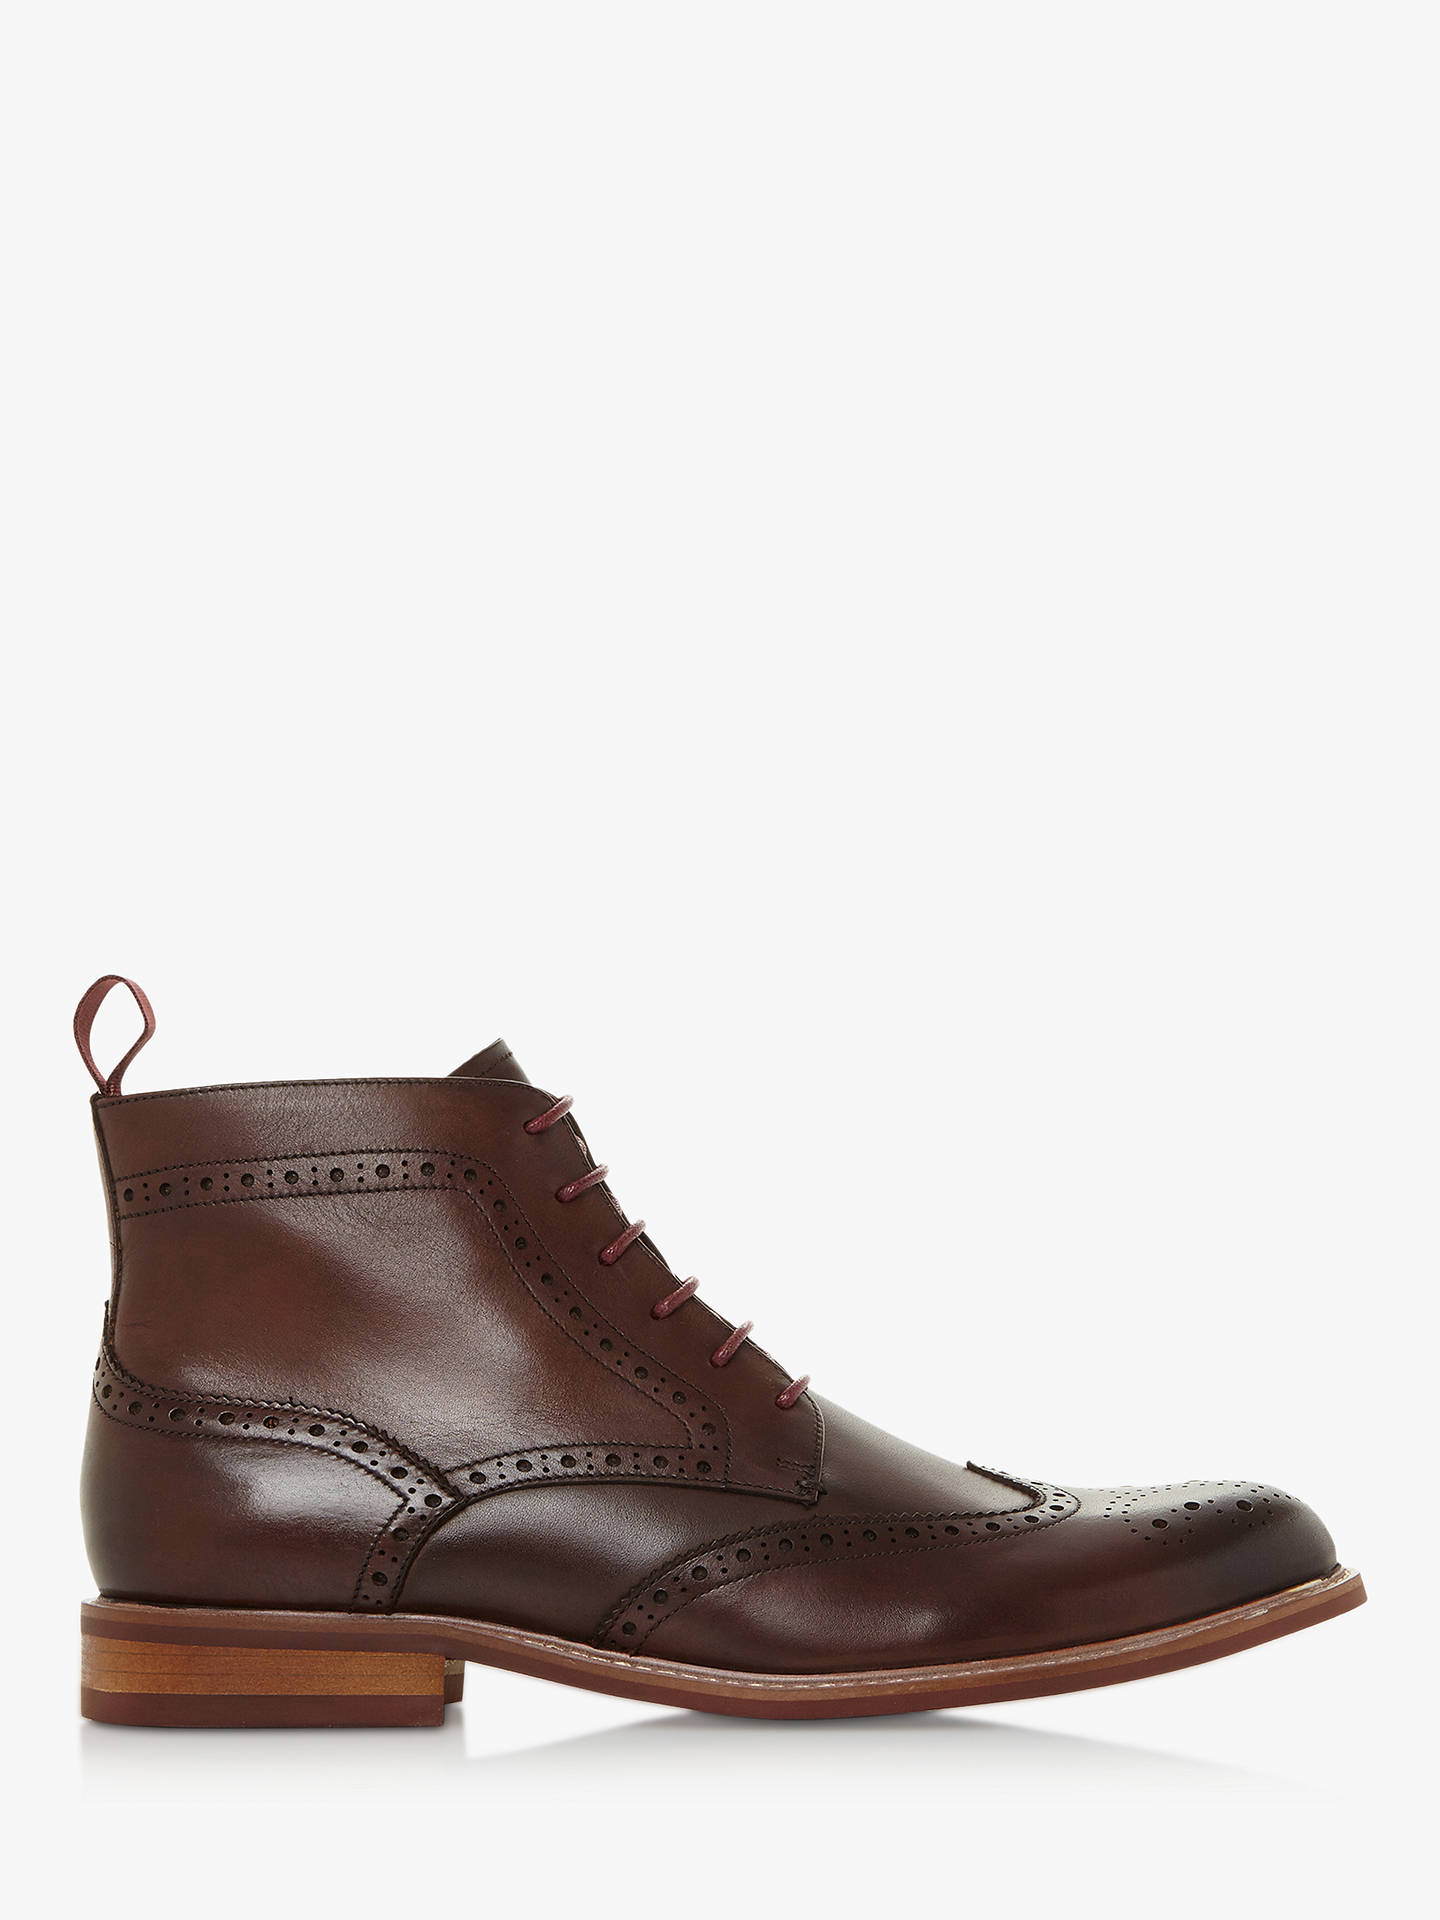 0949606d159 Dune Marila Leather Brogue Boots at John Lewis   Partners